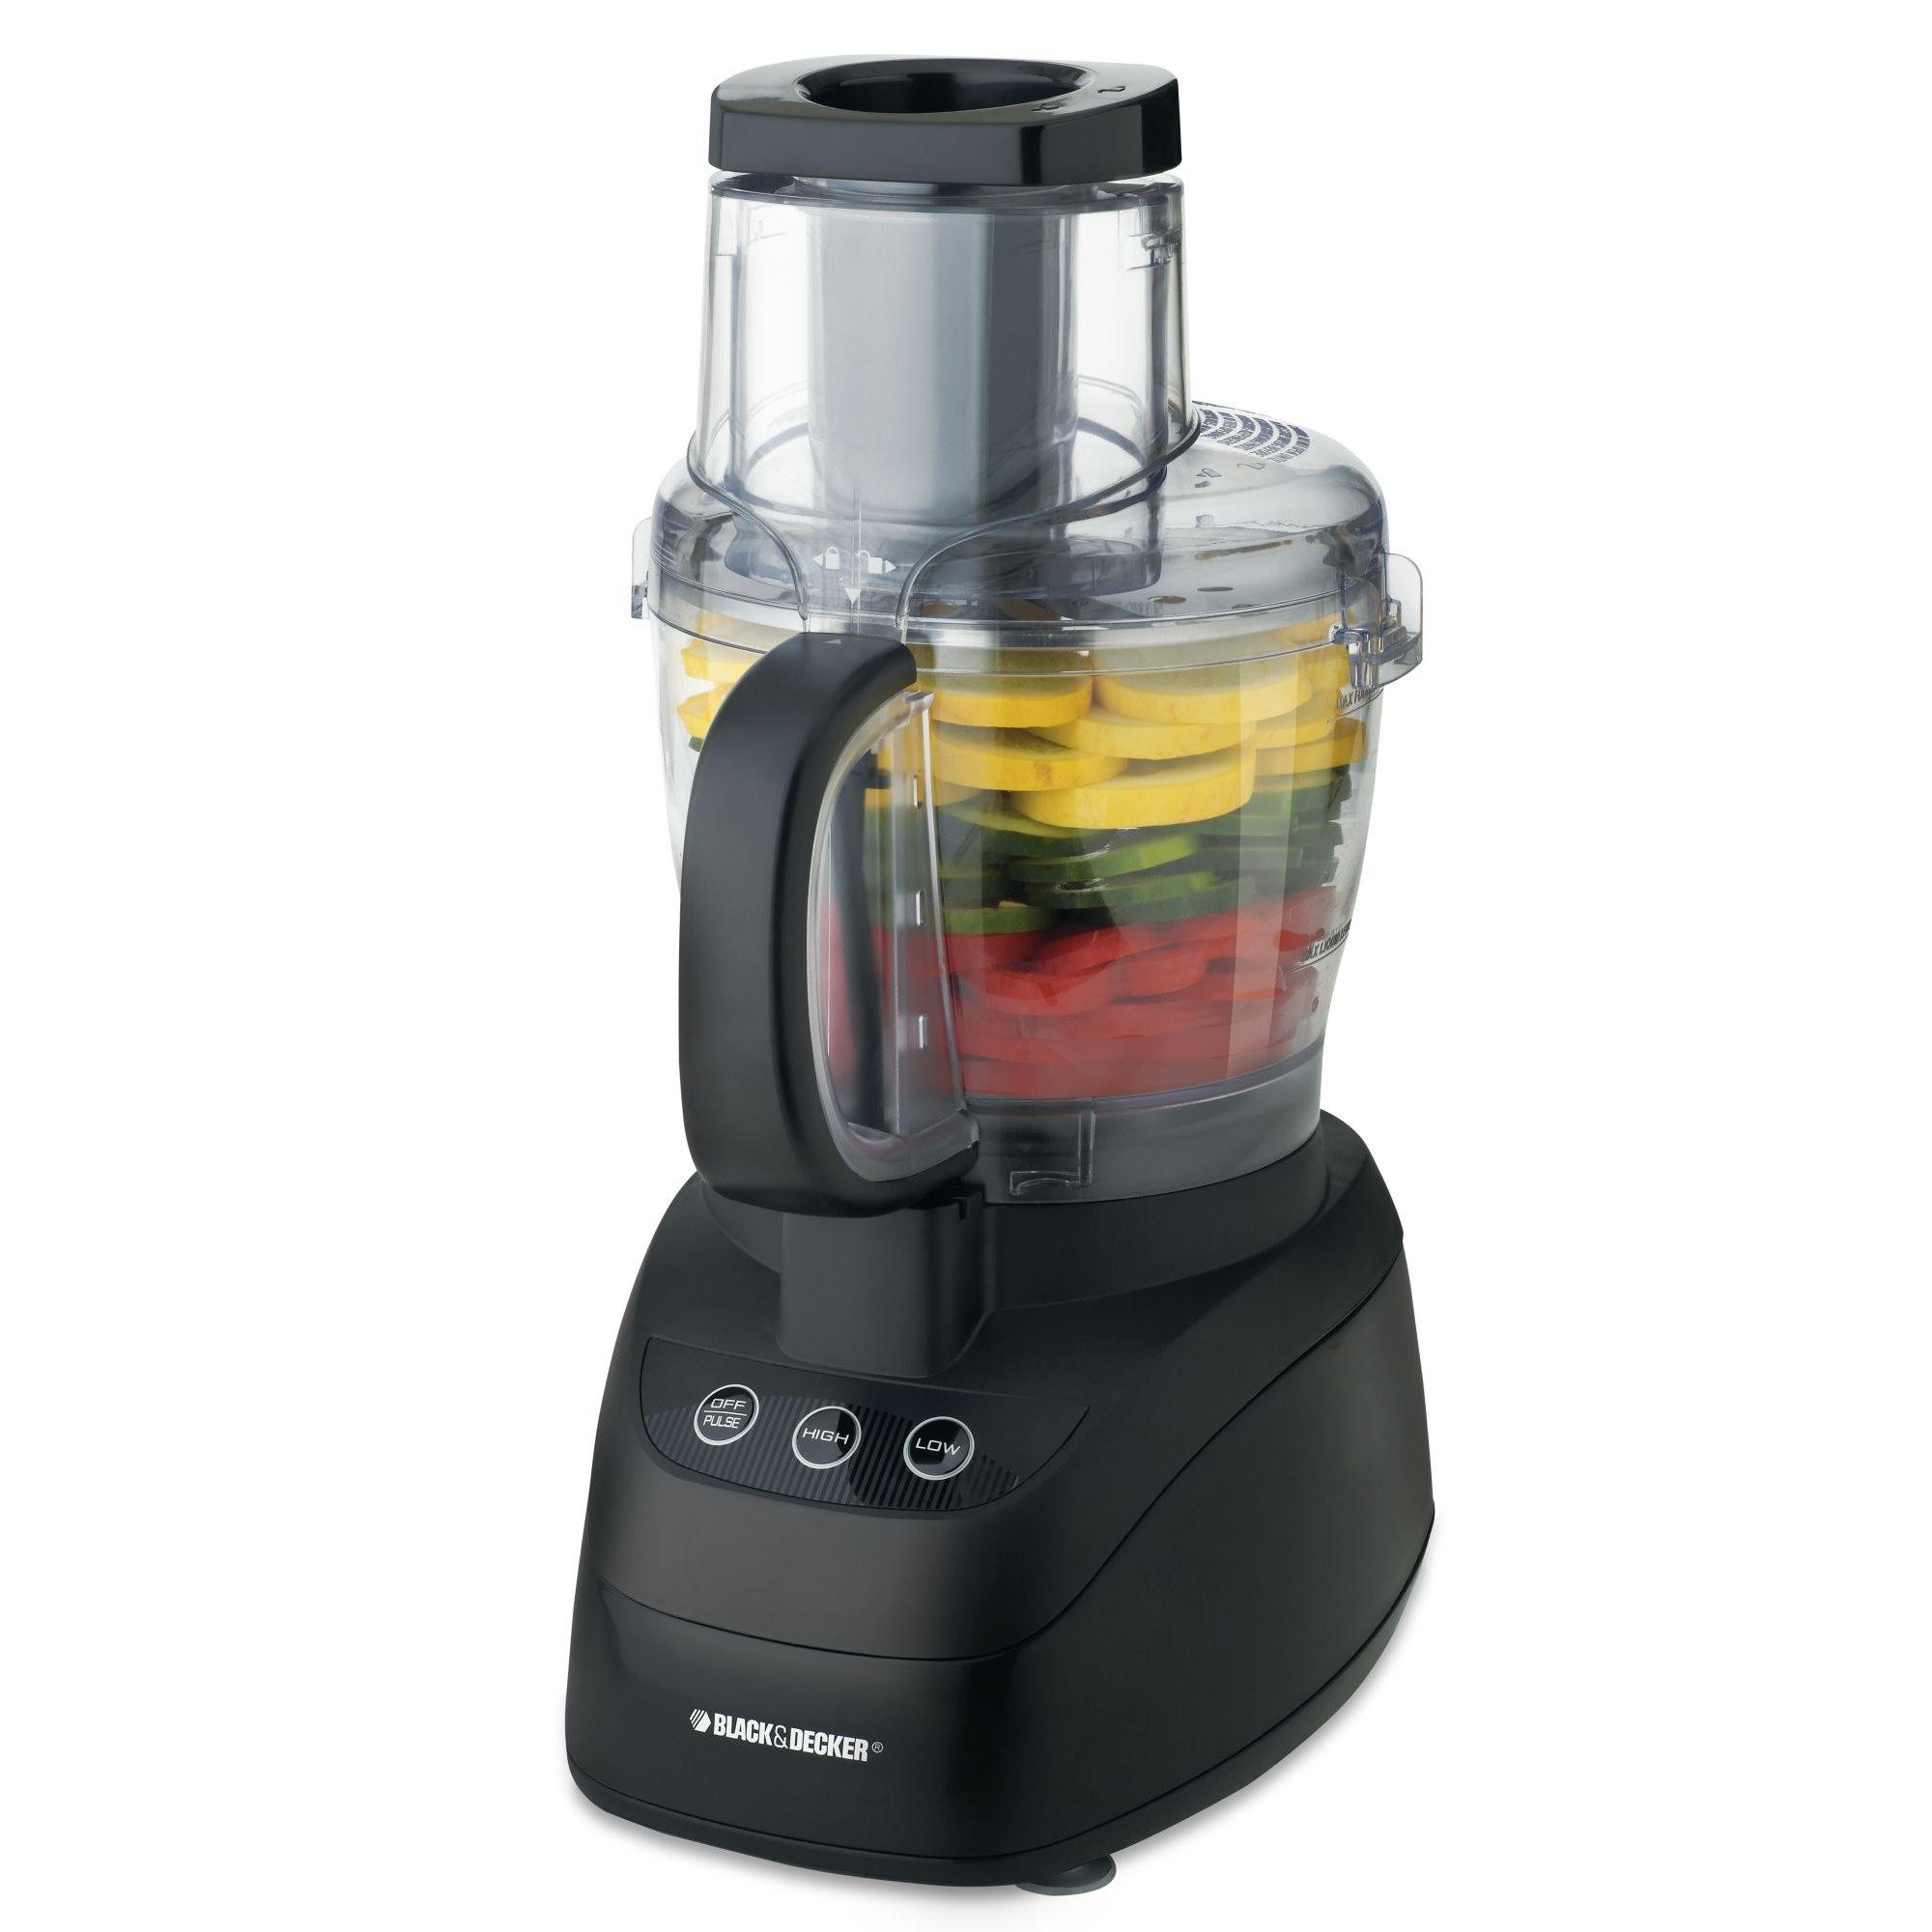 Black Decker WideMouth 10 cup Food Processor Black